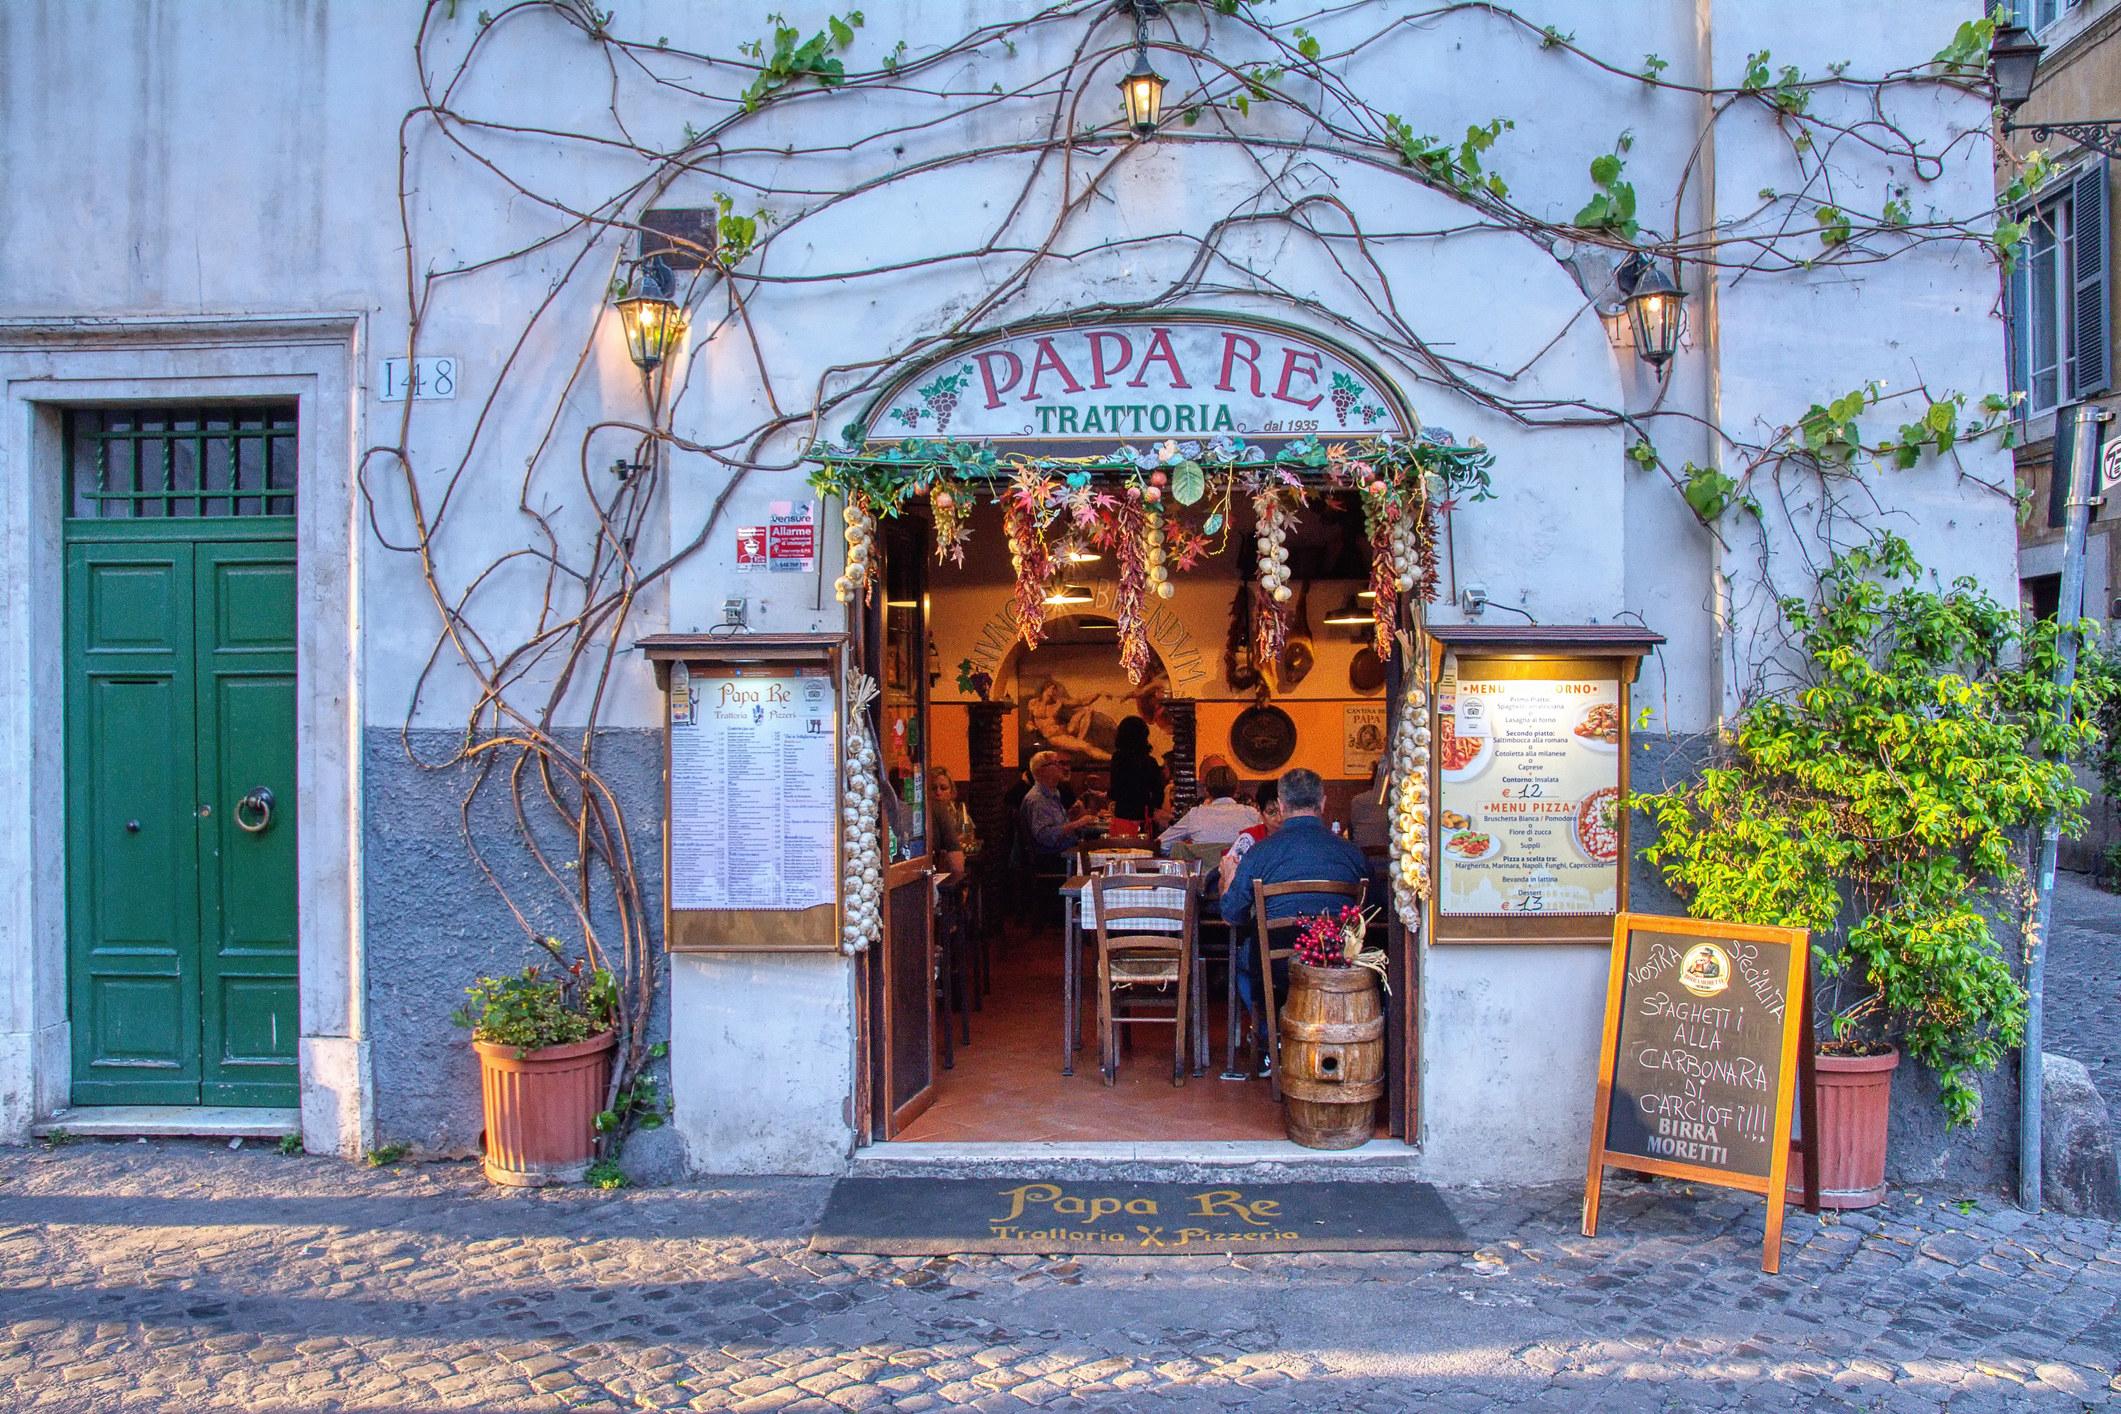 A cute Italian restaurant.